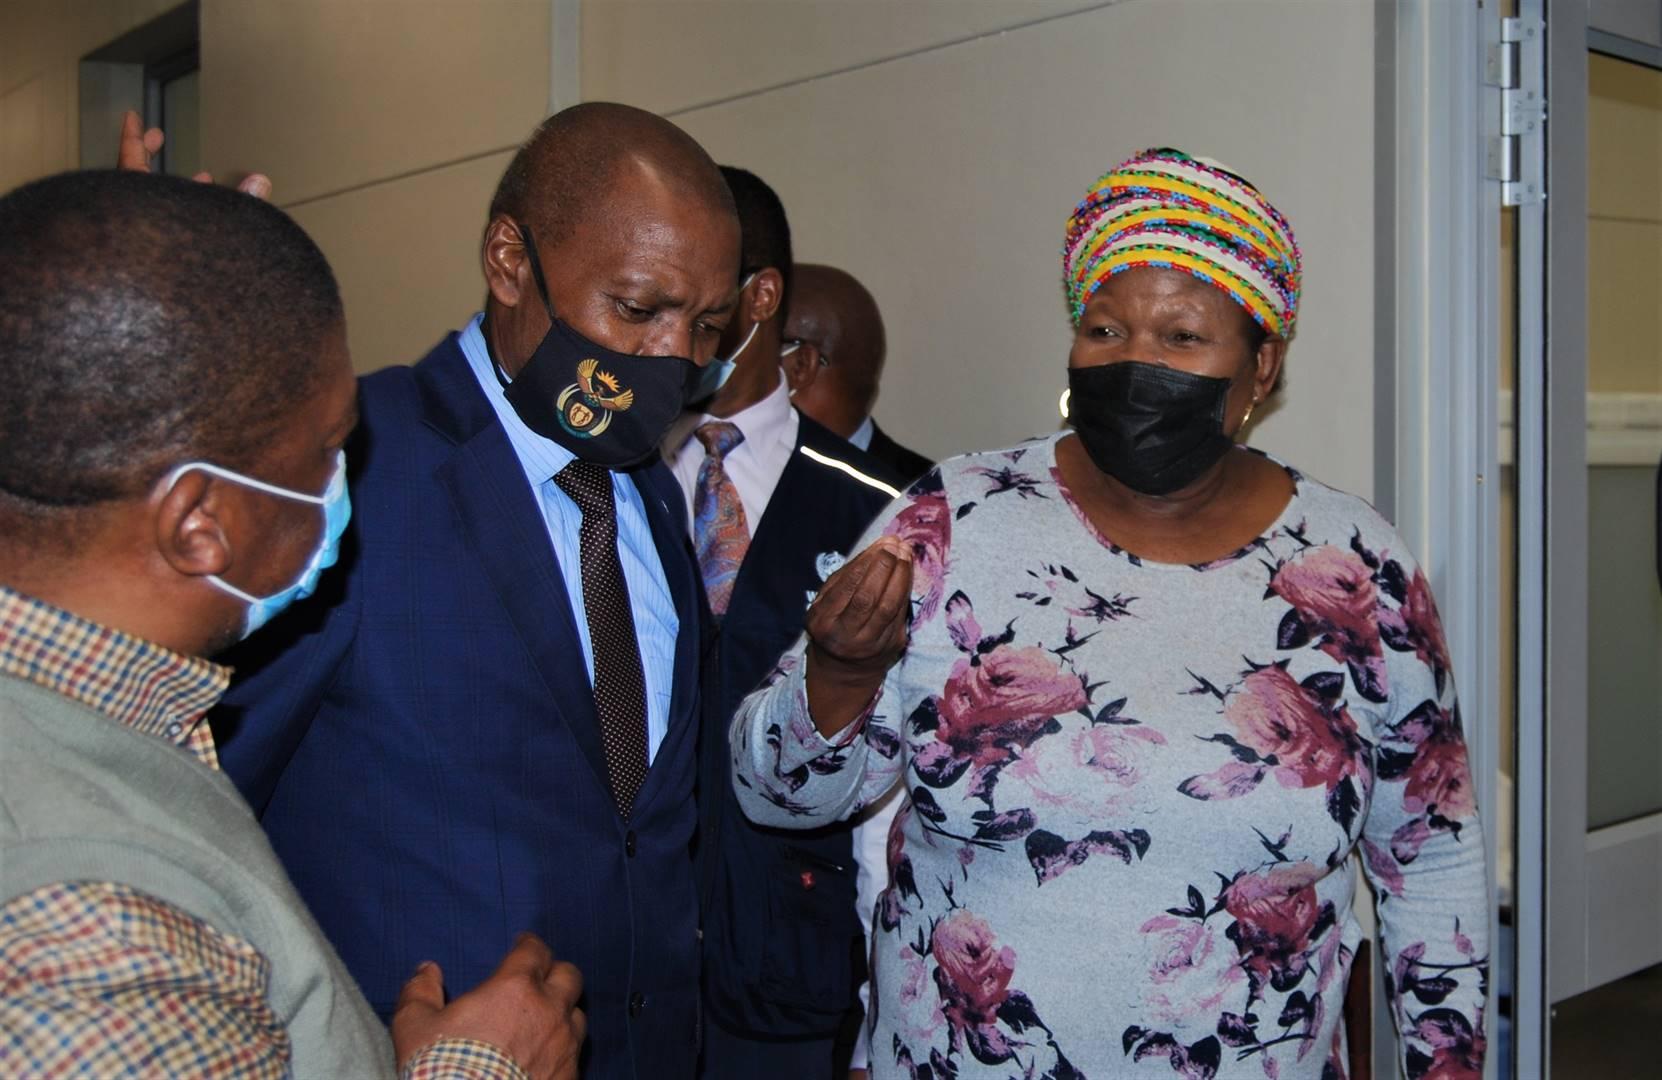 Eastern Cape Health MEC Sindiswa Gomba and Health Minister Zweli Mkhize